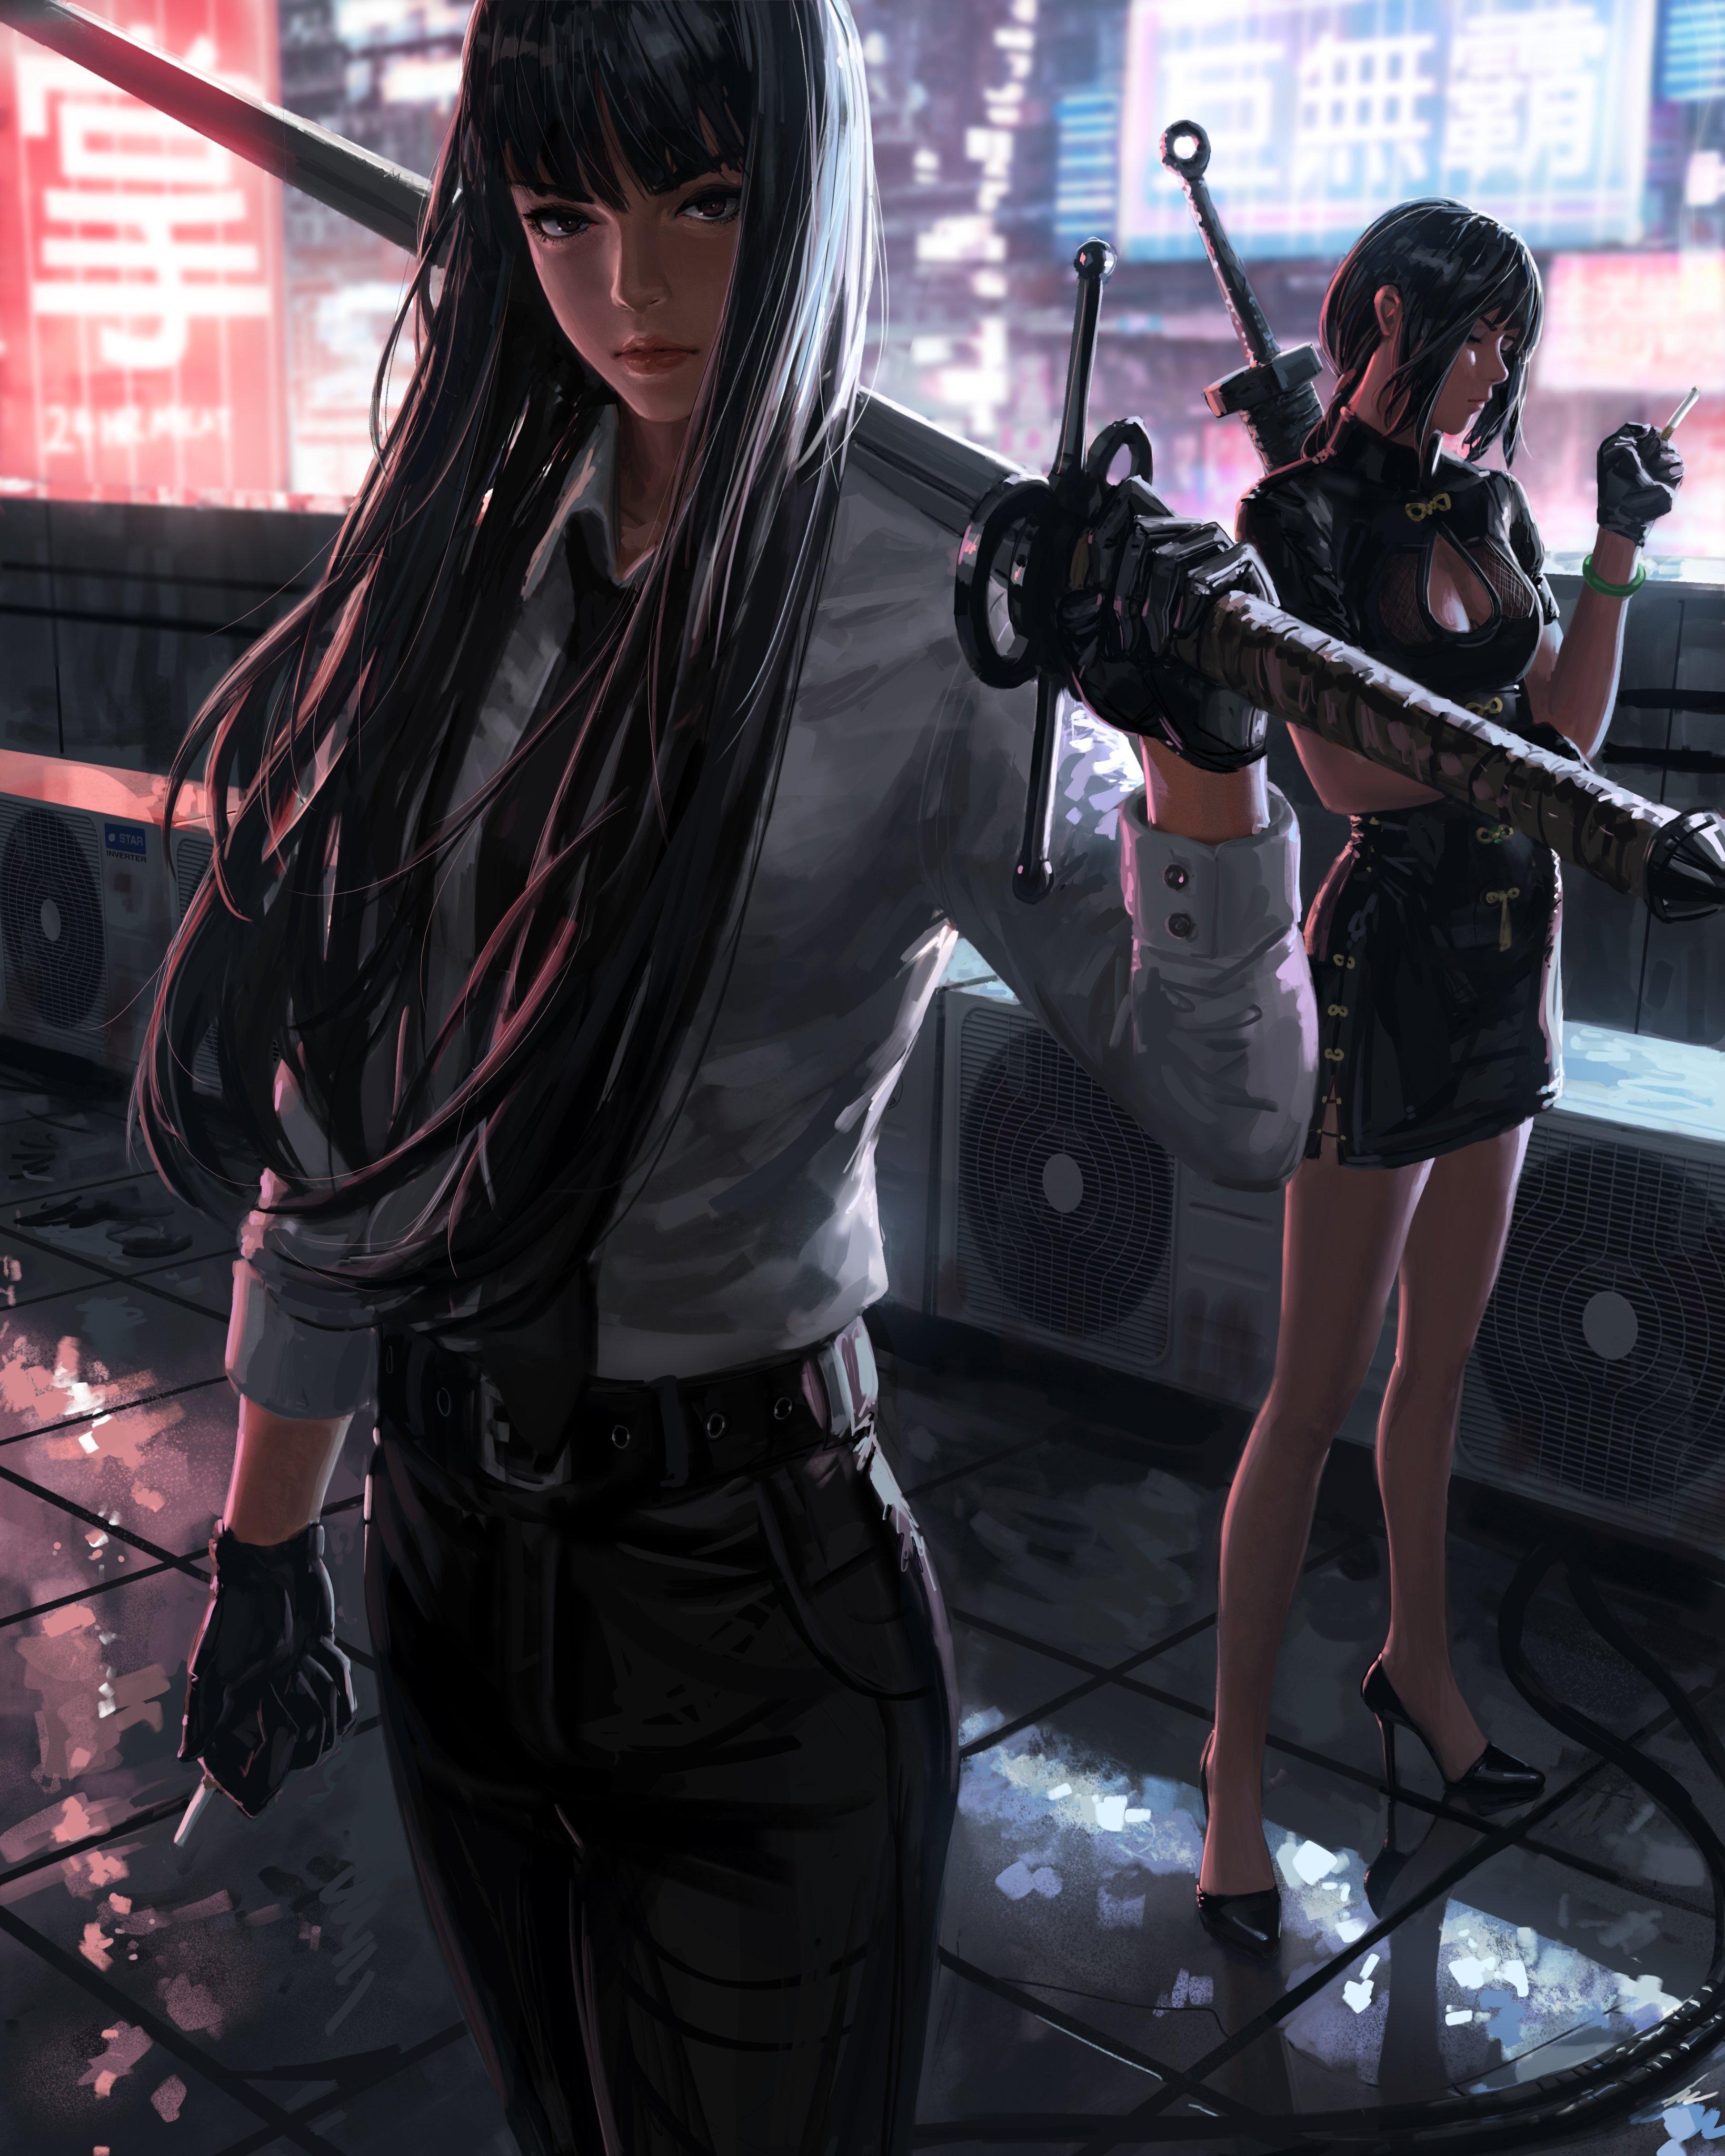 General 3277x4096 digital art female warrior Bad guys artwork GUWEIZ long sword sword katana